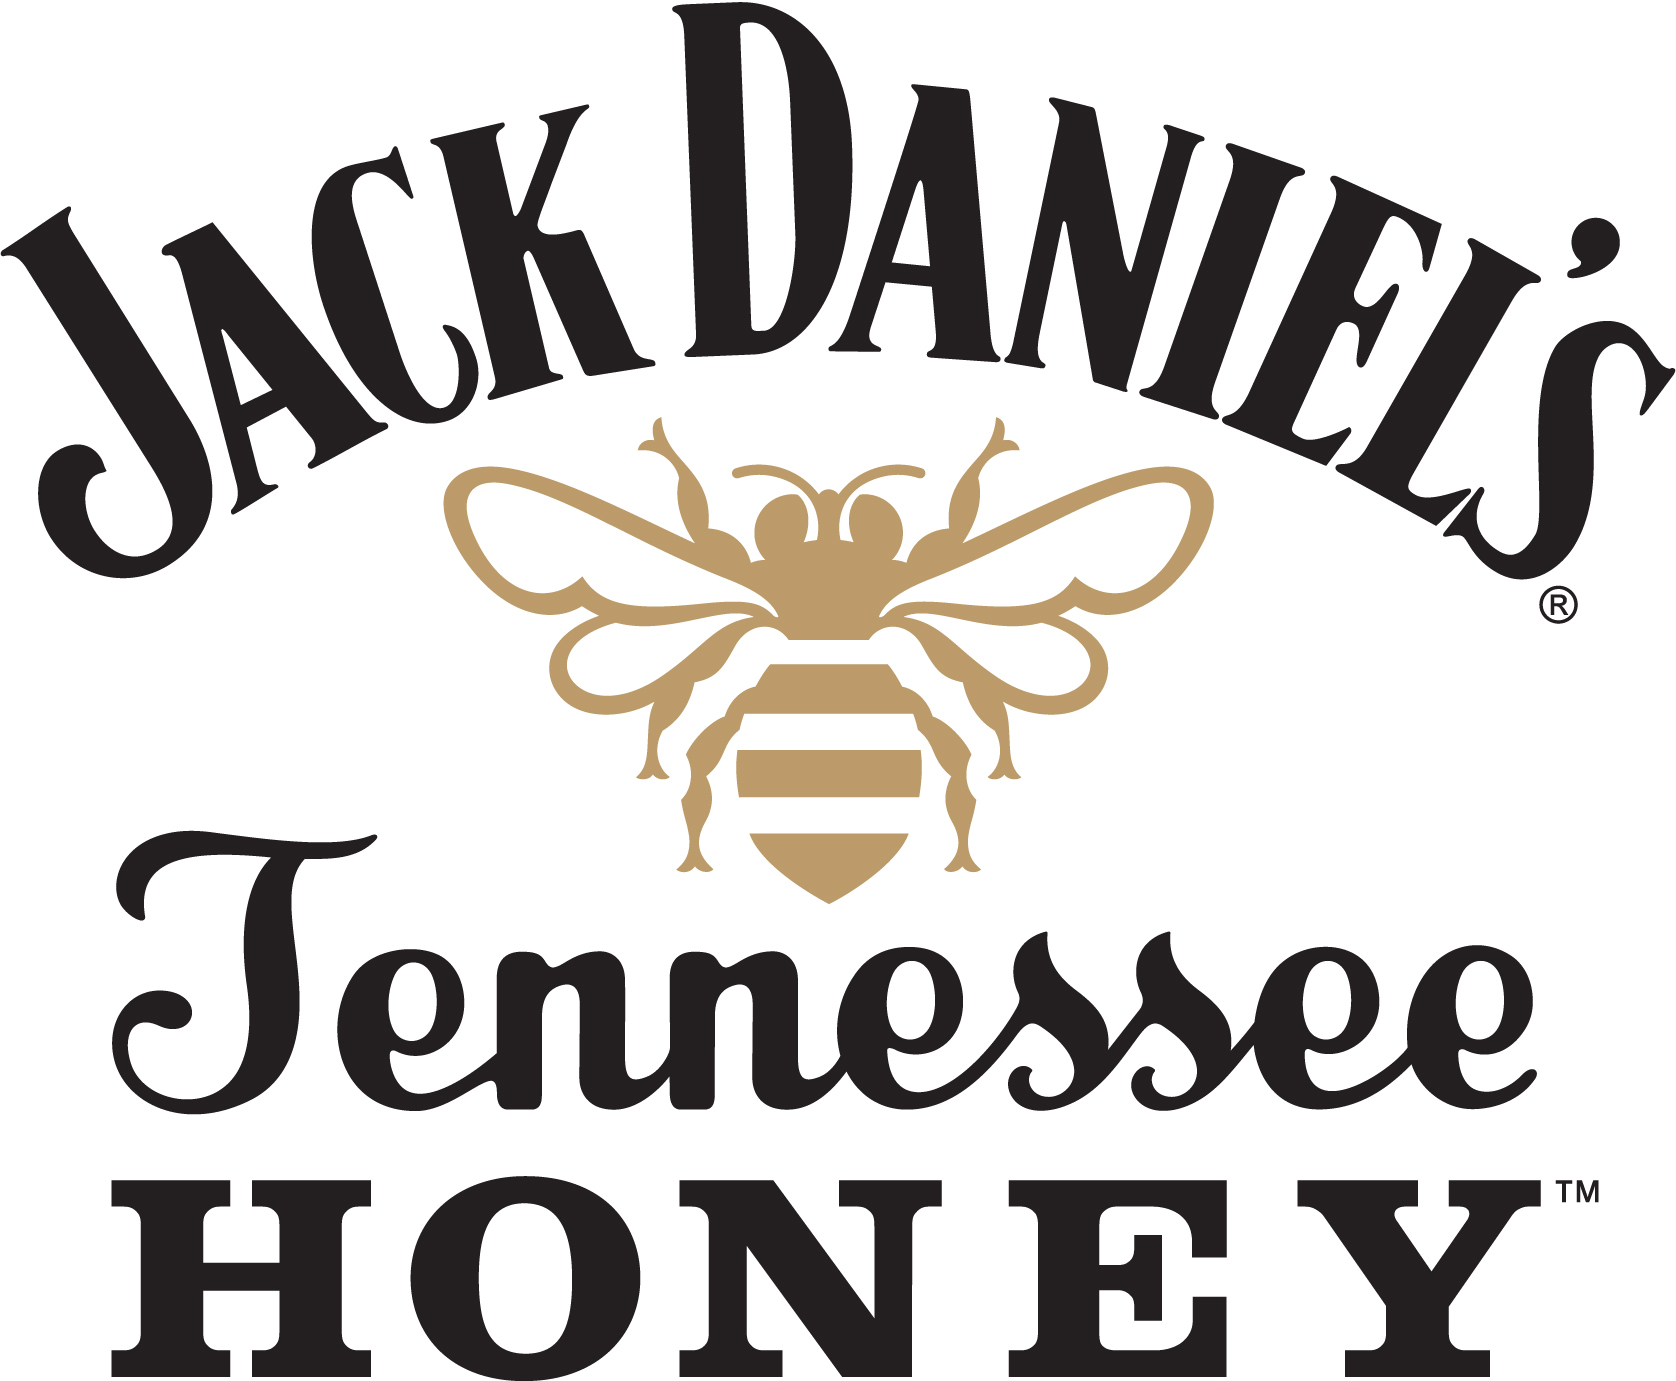 jack daniel s honey hysteria cocktail competition march 16th rh tonybrunoshow com jack daniels logo template generator jack daniels logo template generator